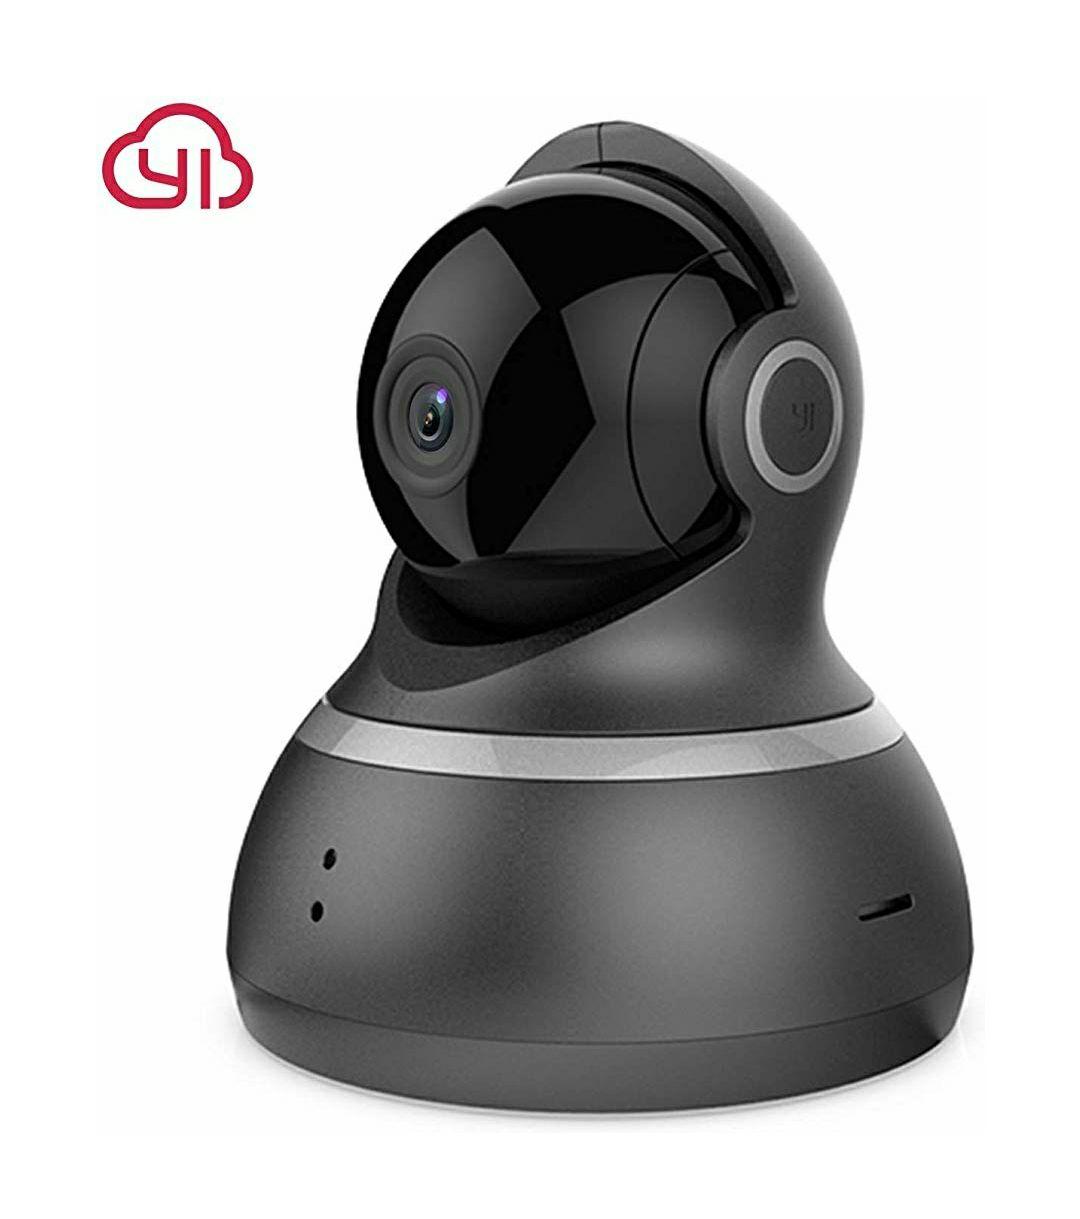 YI Camara Vigilancia 1080p 360º